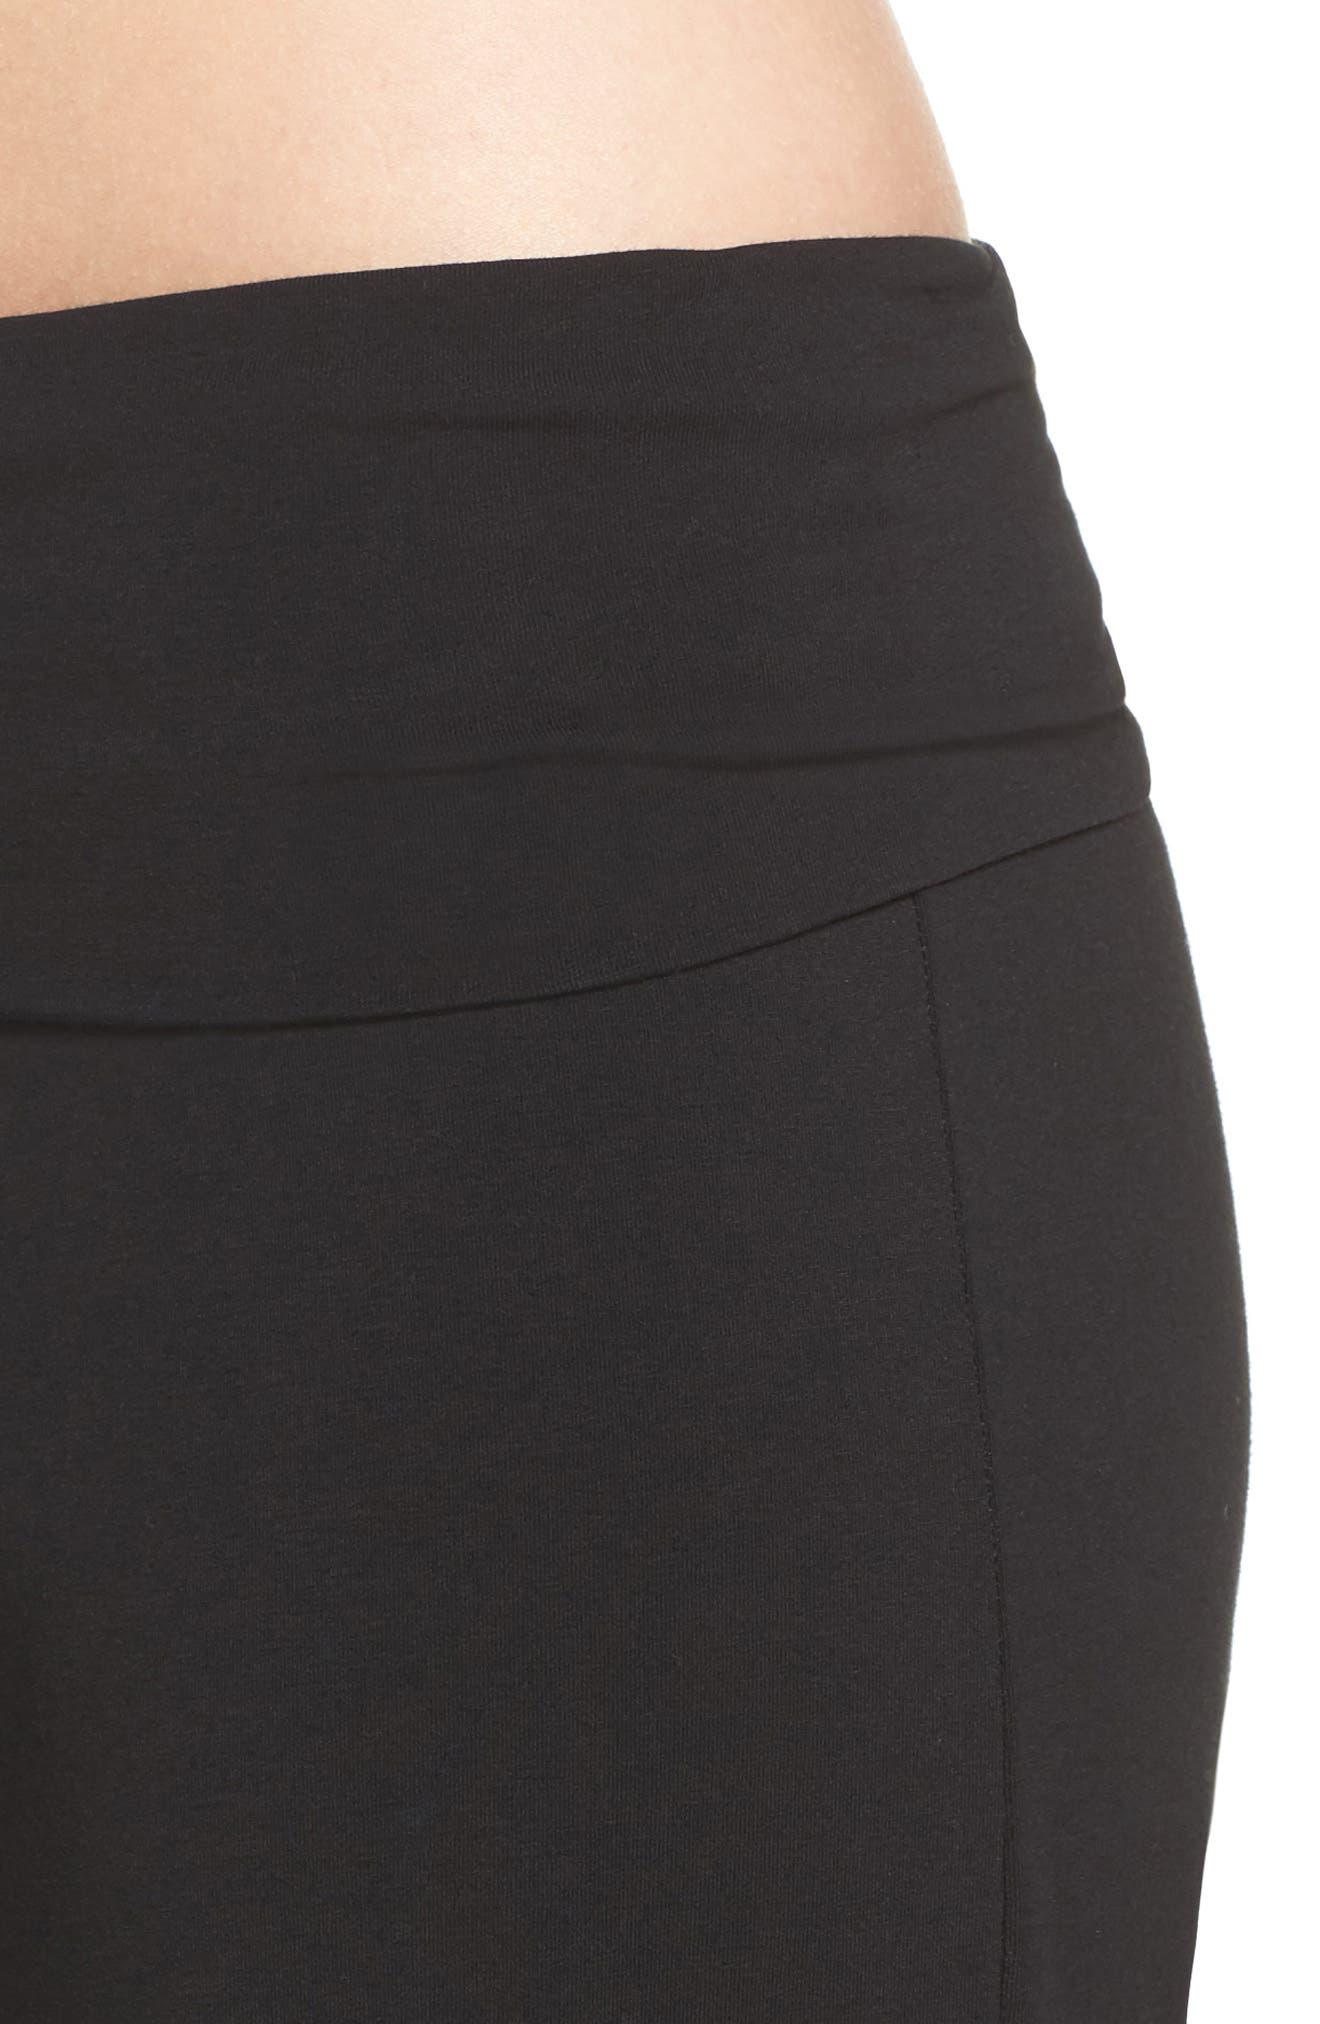 Wide Leg Stretch Cotton Pajama Pants,                             Alternate thumbnail 4, color,                             001